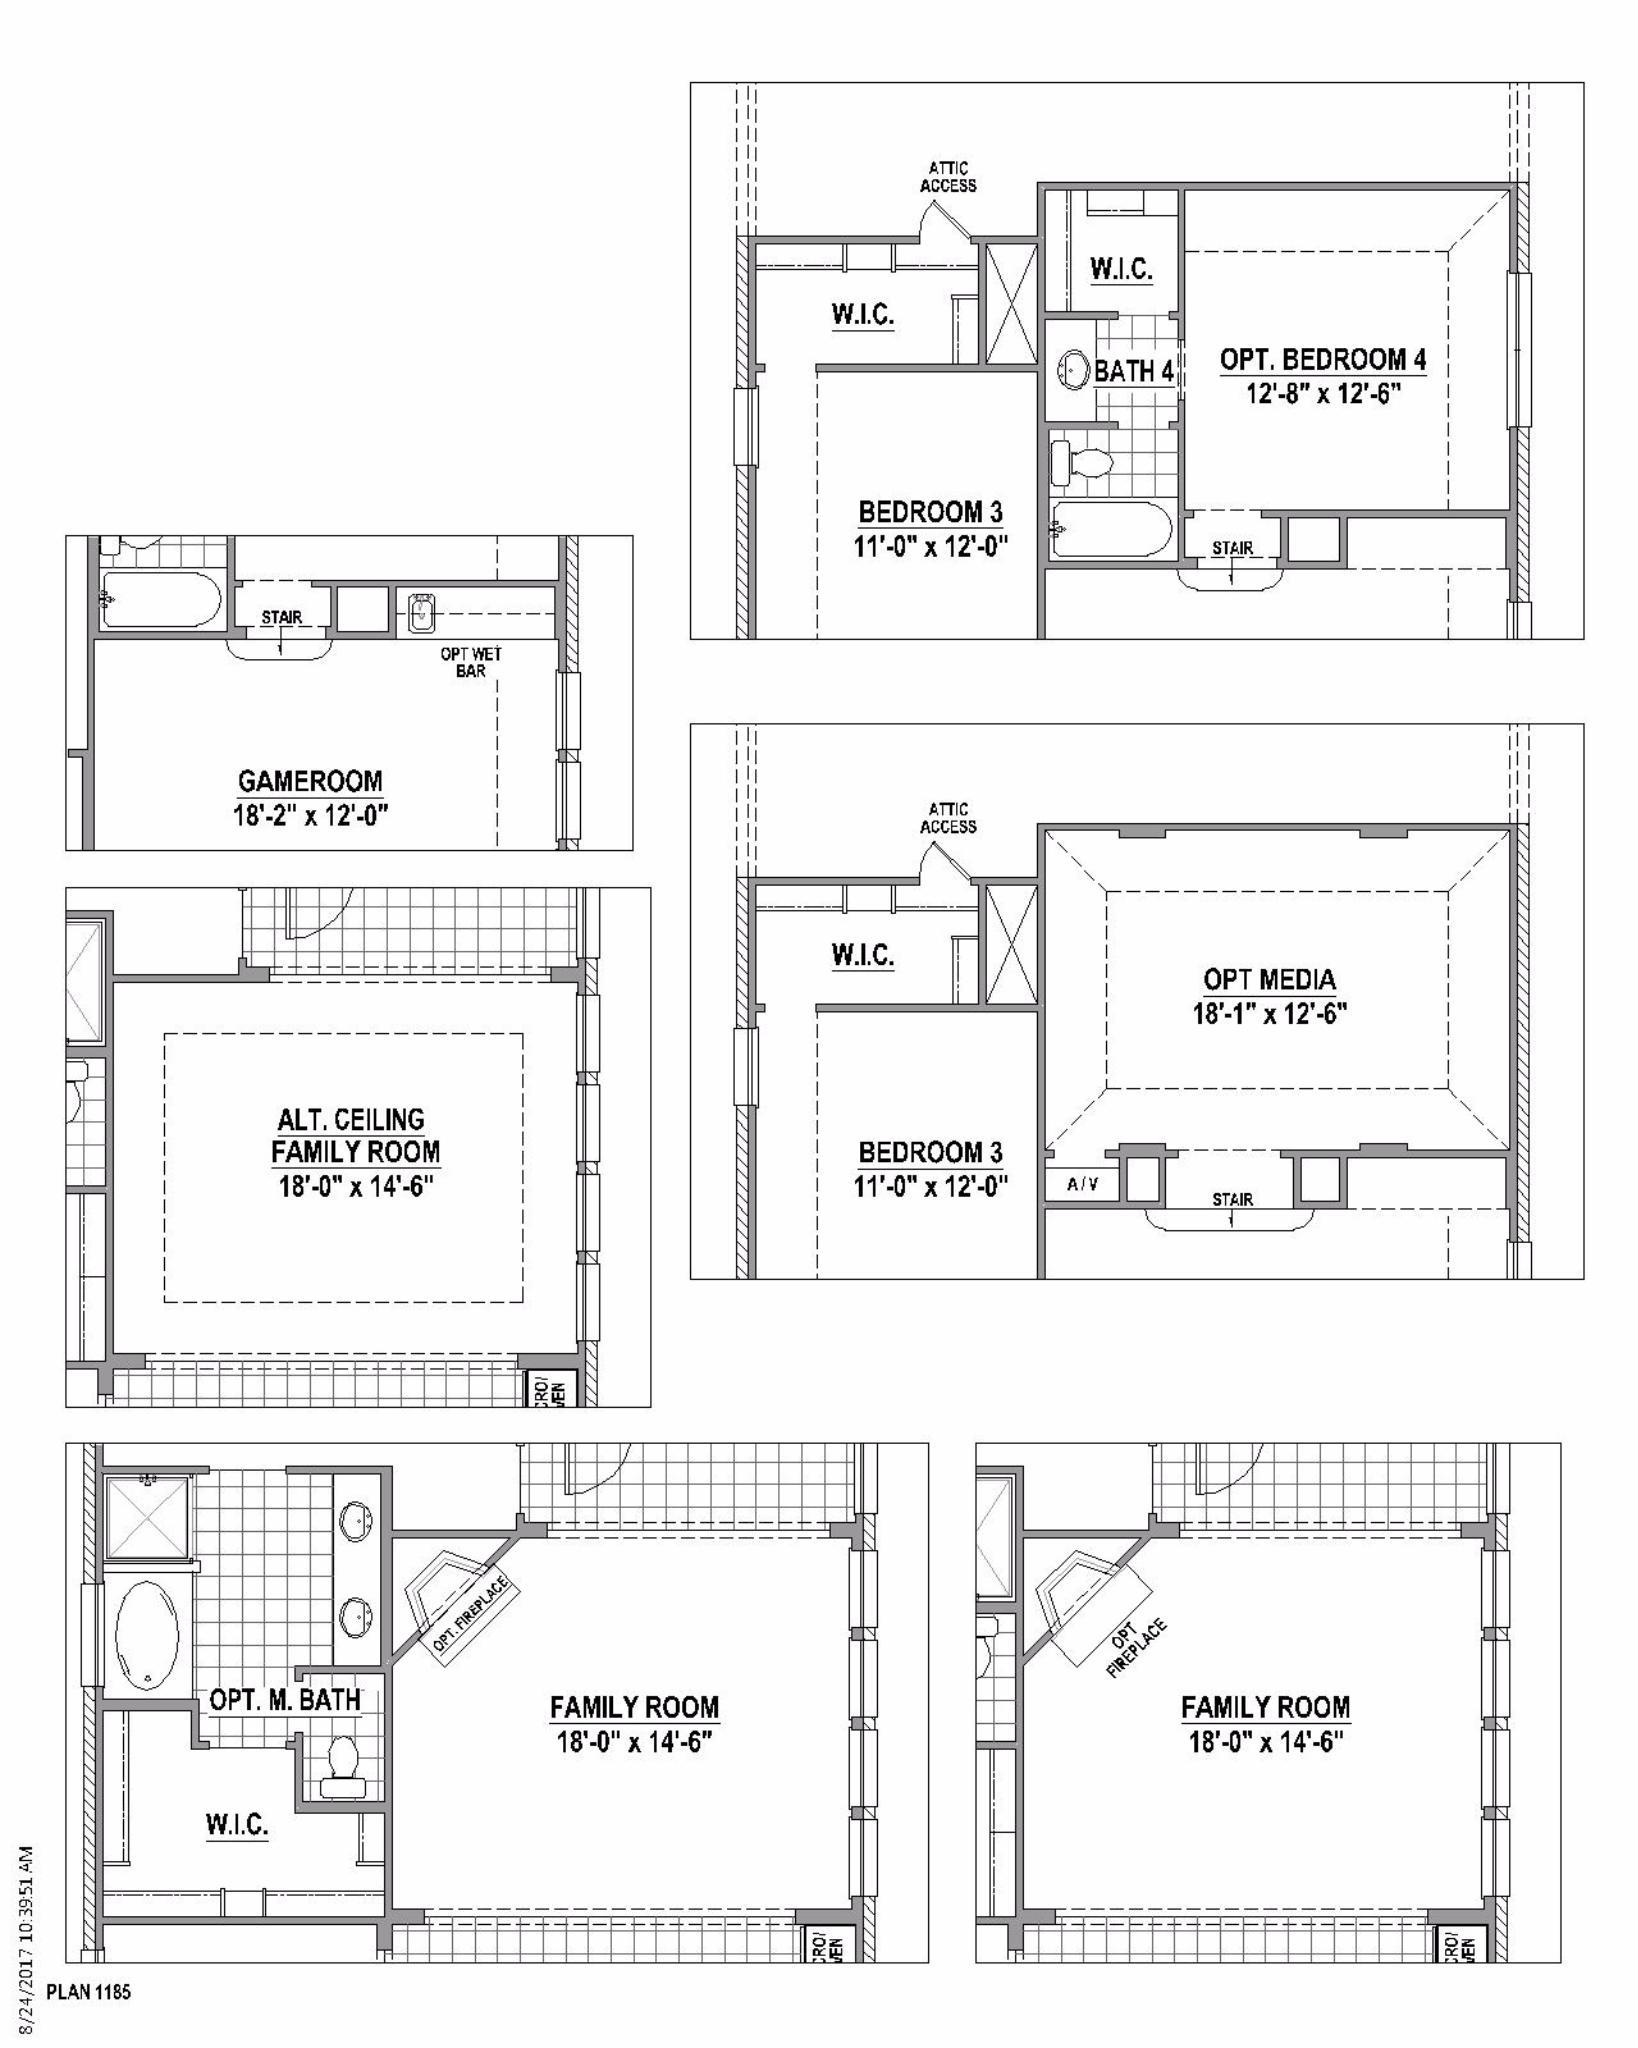 Plan 1185 Floor Plan